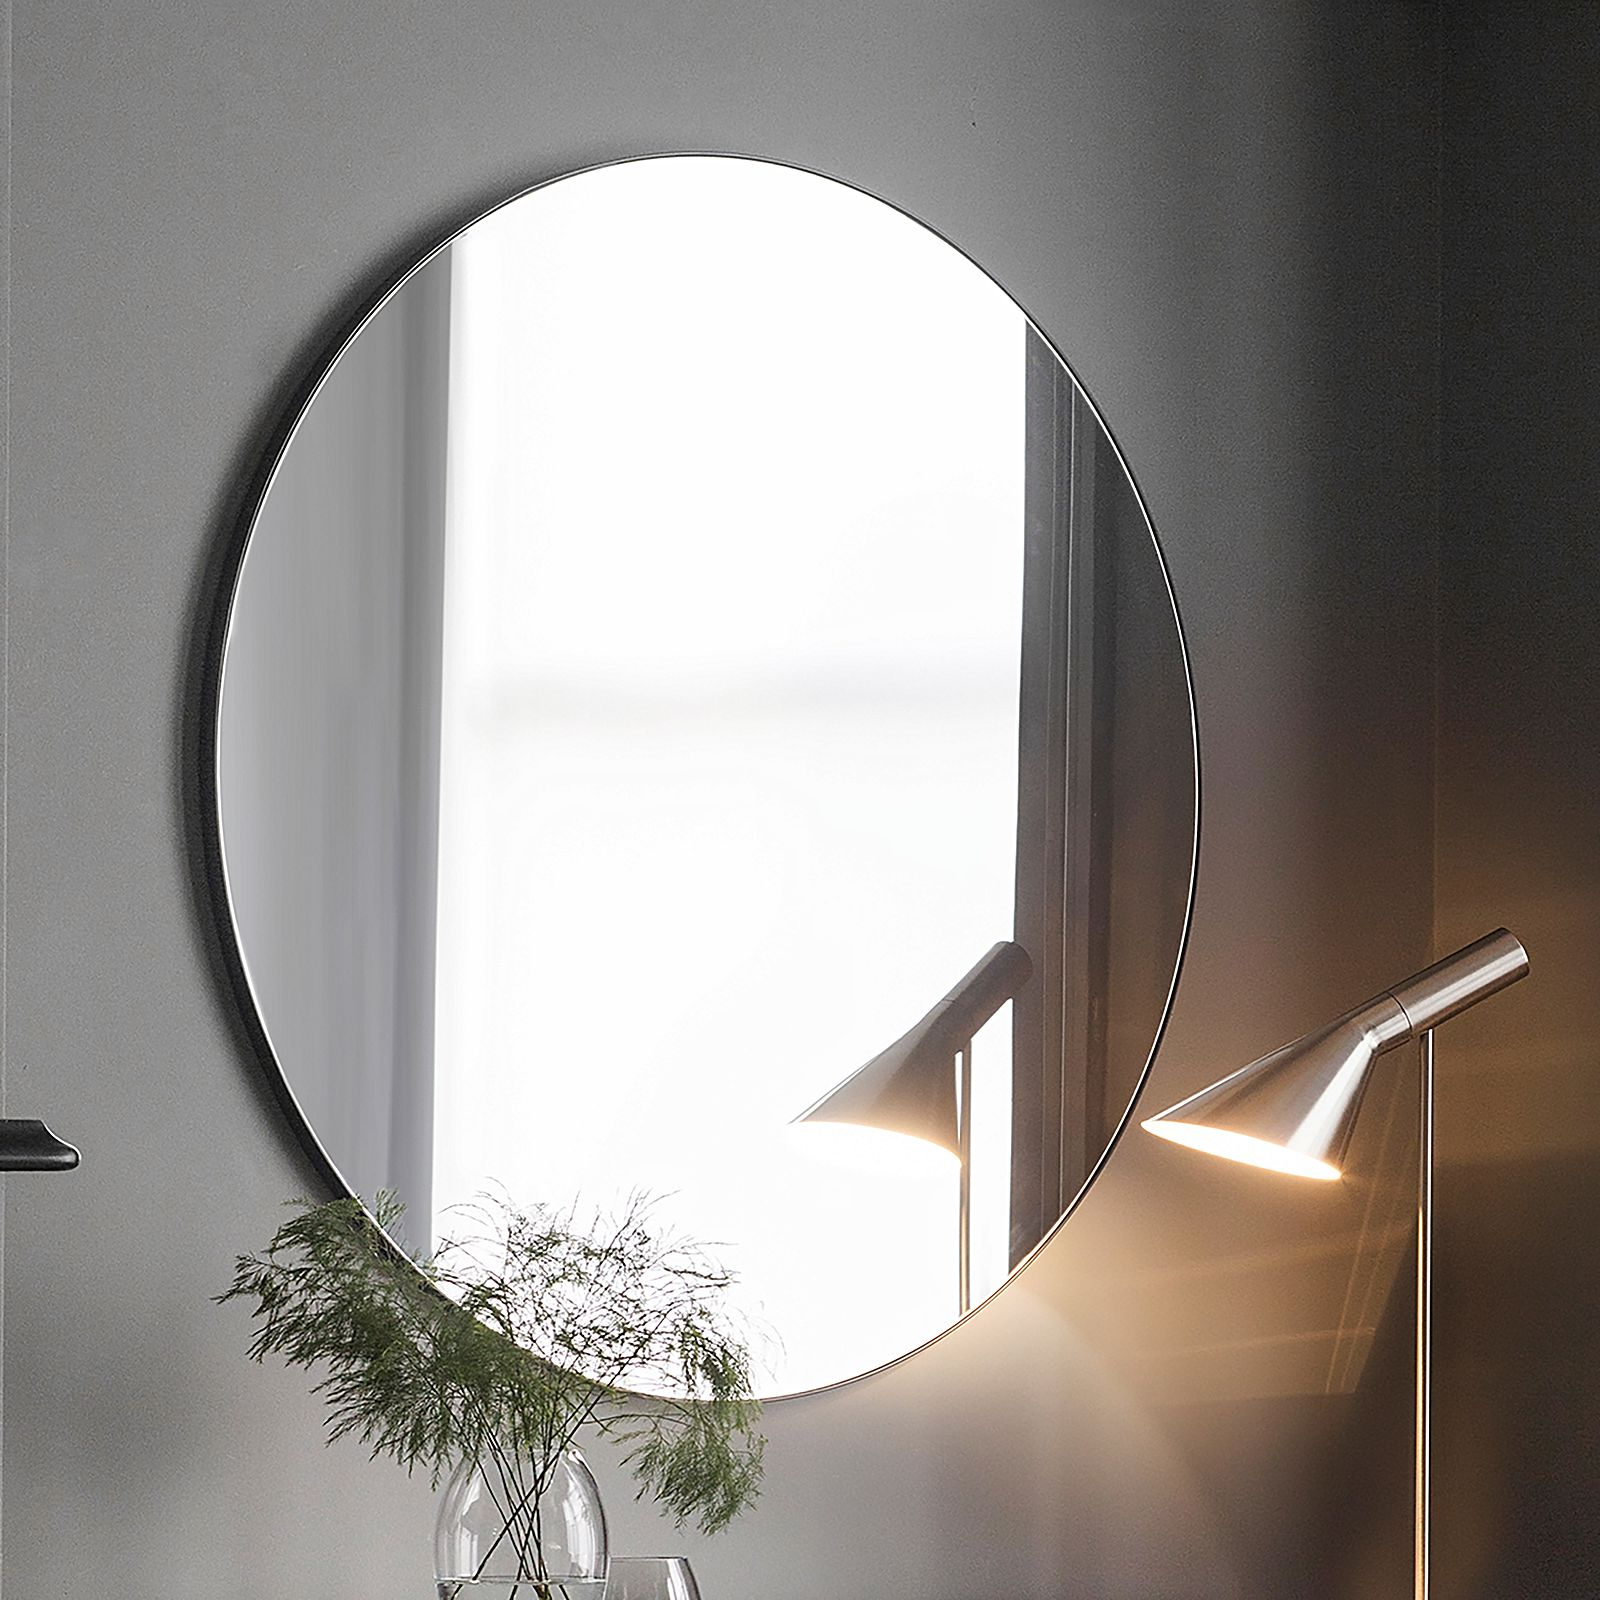 Round Black Wall Mirrors Regarding Popular Coralie Round Wall Mirror, Black (View 13 of 20)